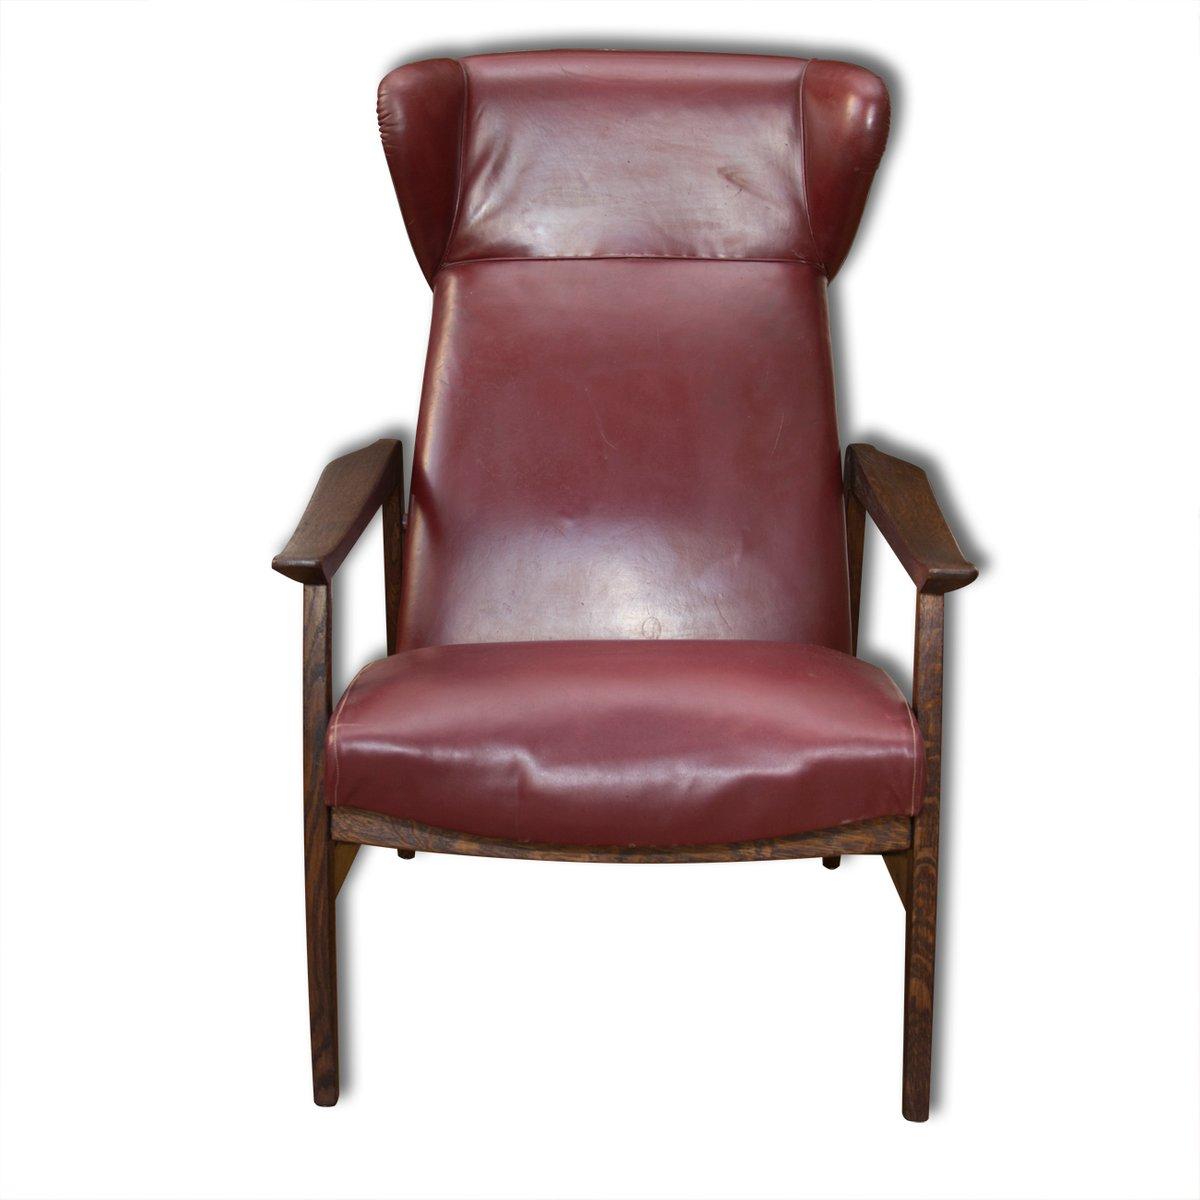 fauteuil oreilles en cuir ajustable europe 1940s en. Black Bedroom Furniture Sets. Home Design Ideas